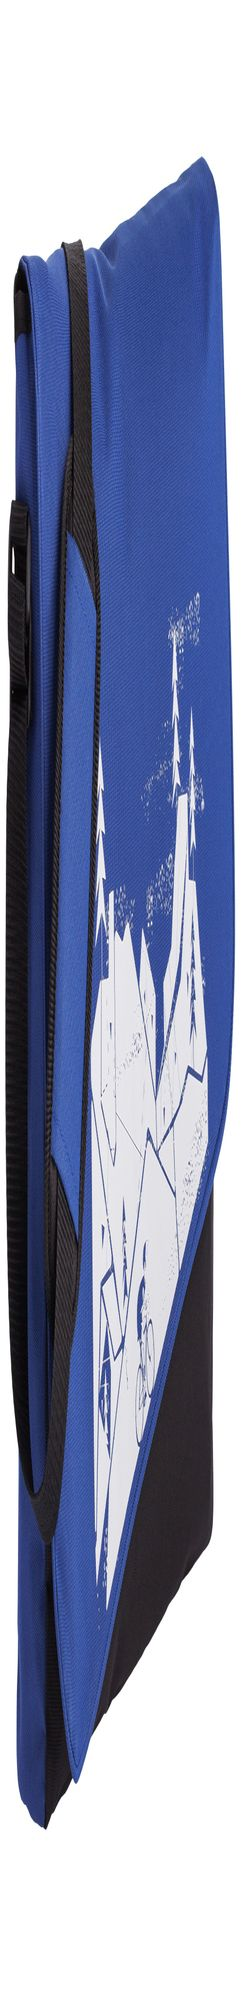 Конференц сумка «Крутой подъем», синяя фото